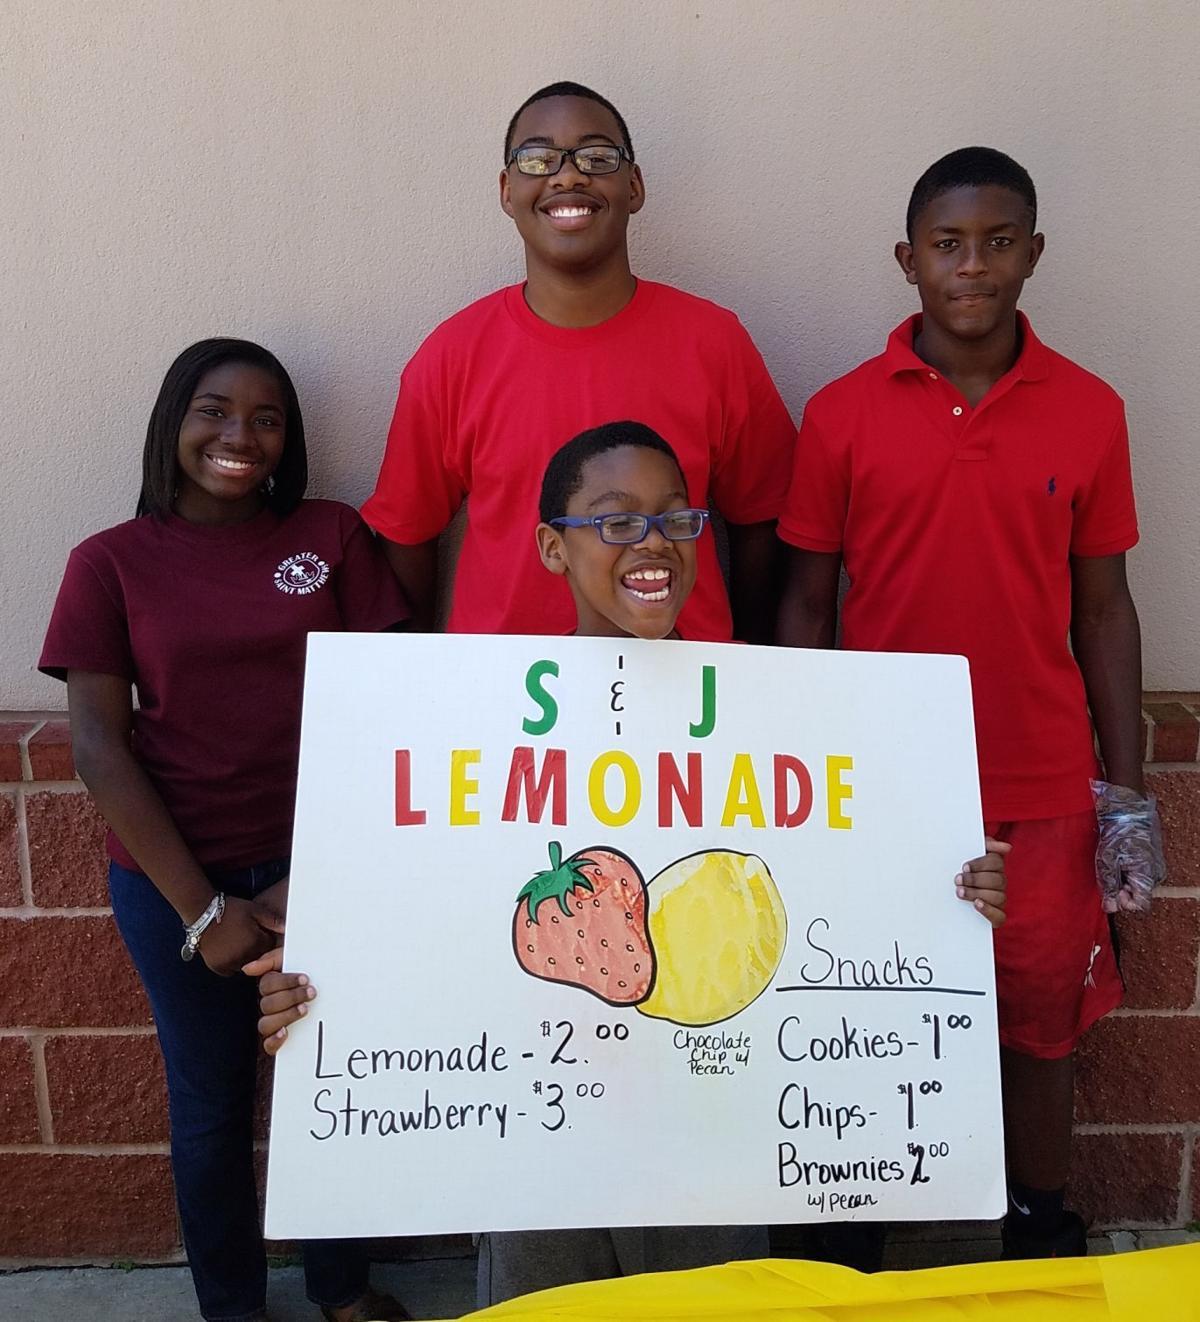 S&J Lemonade